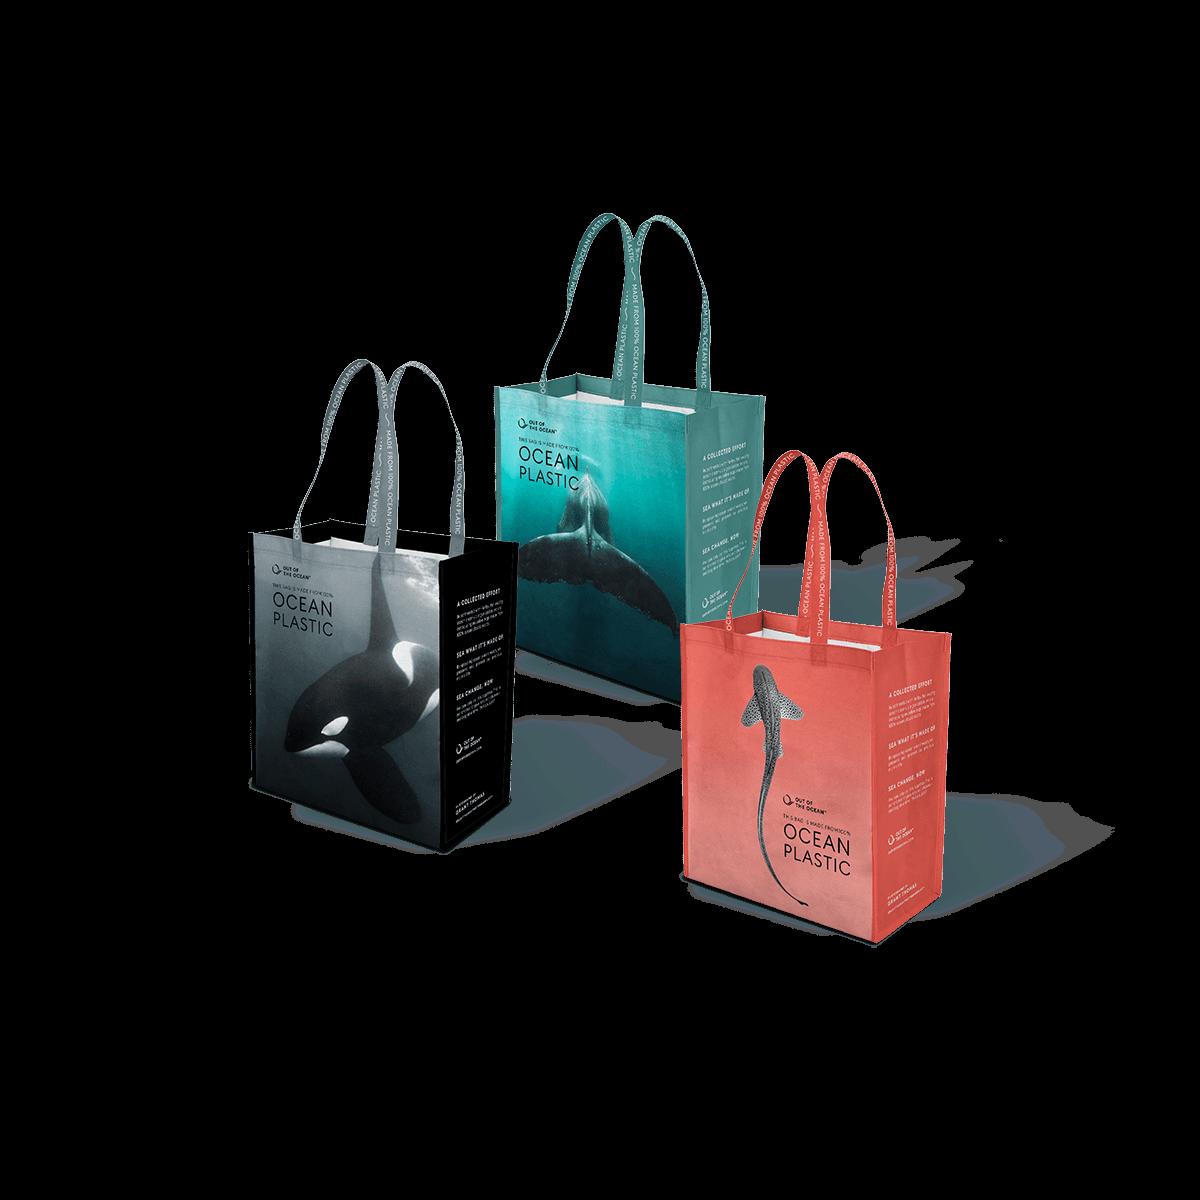 an image of reusable bags